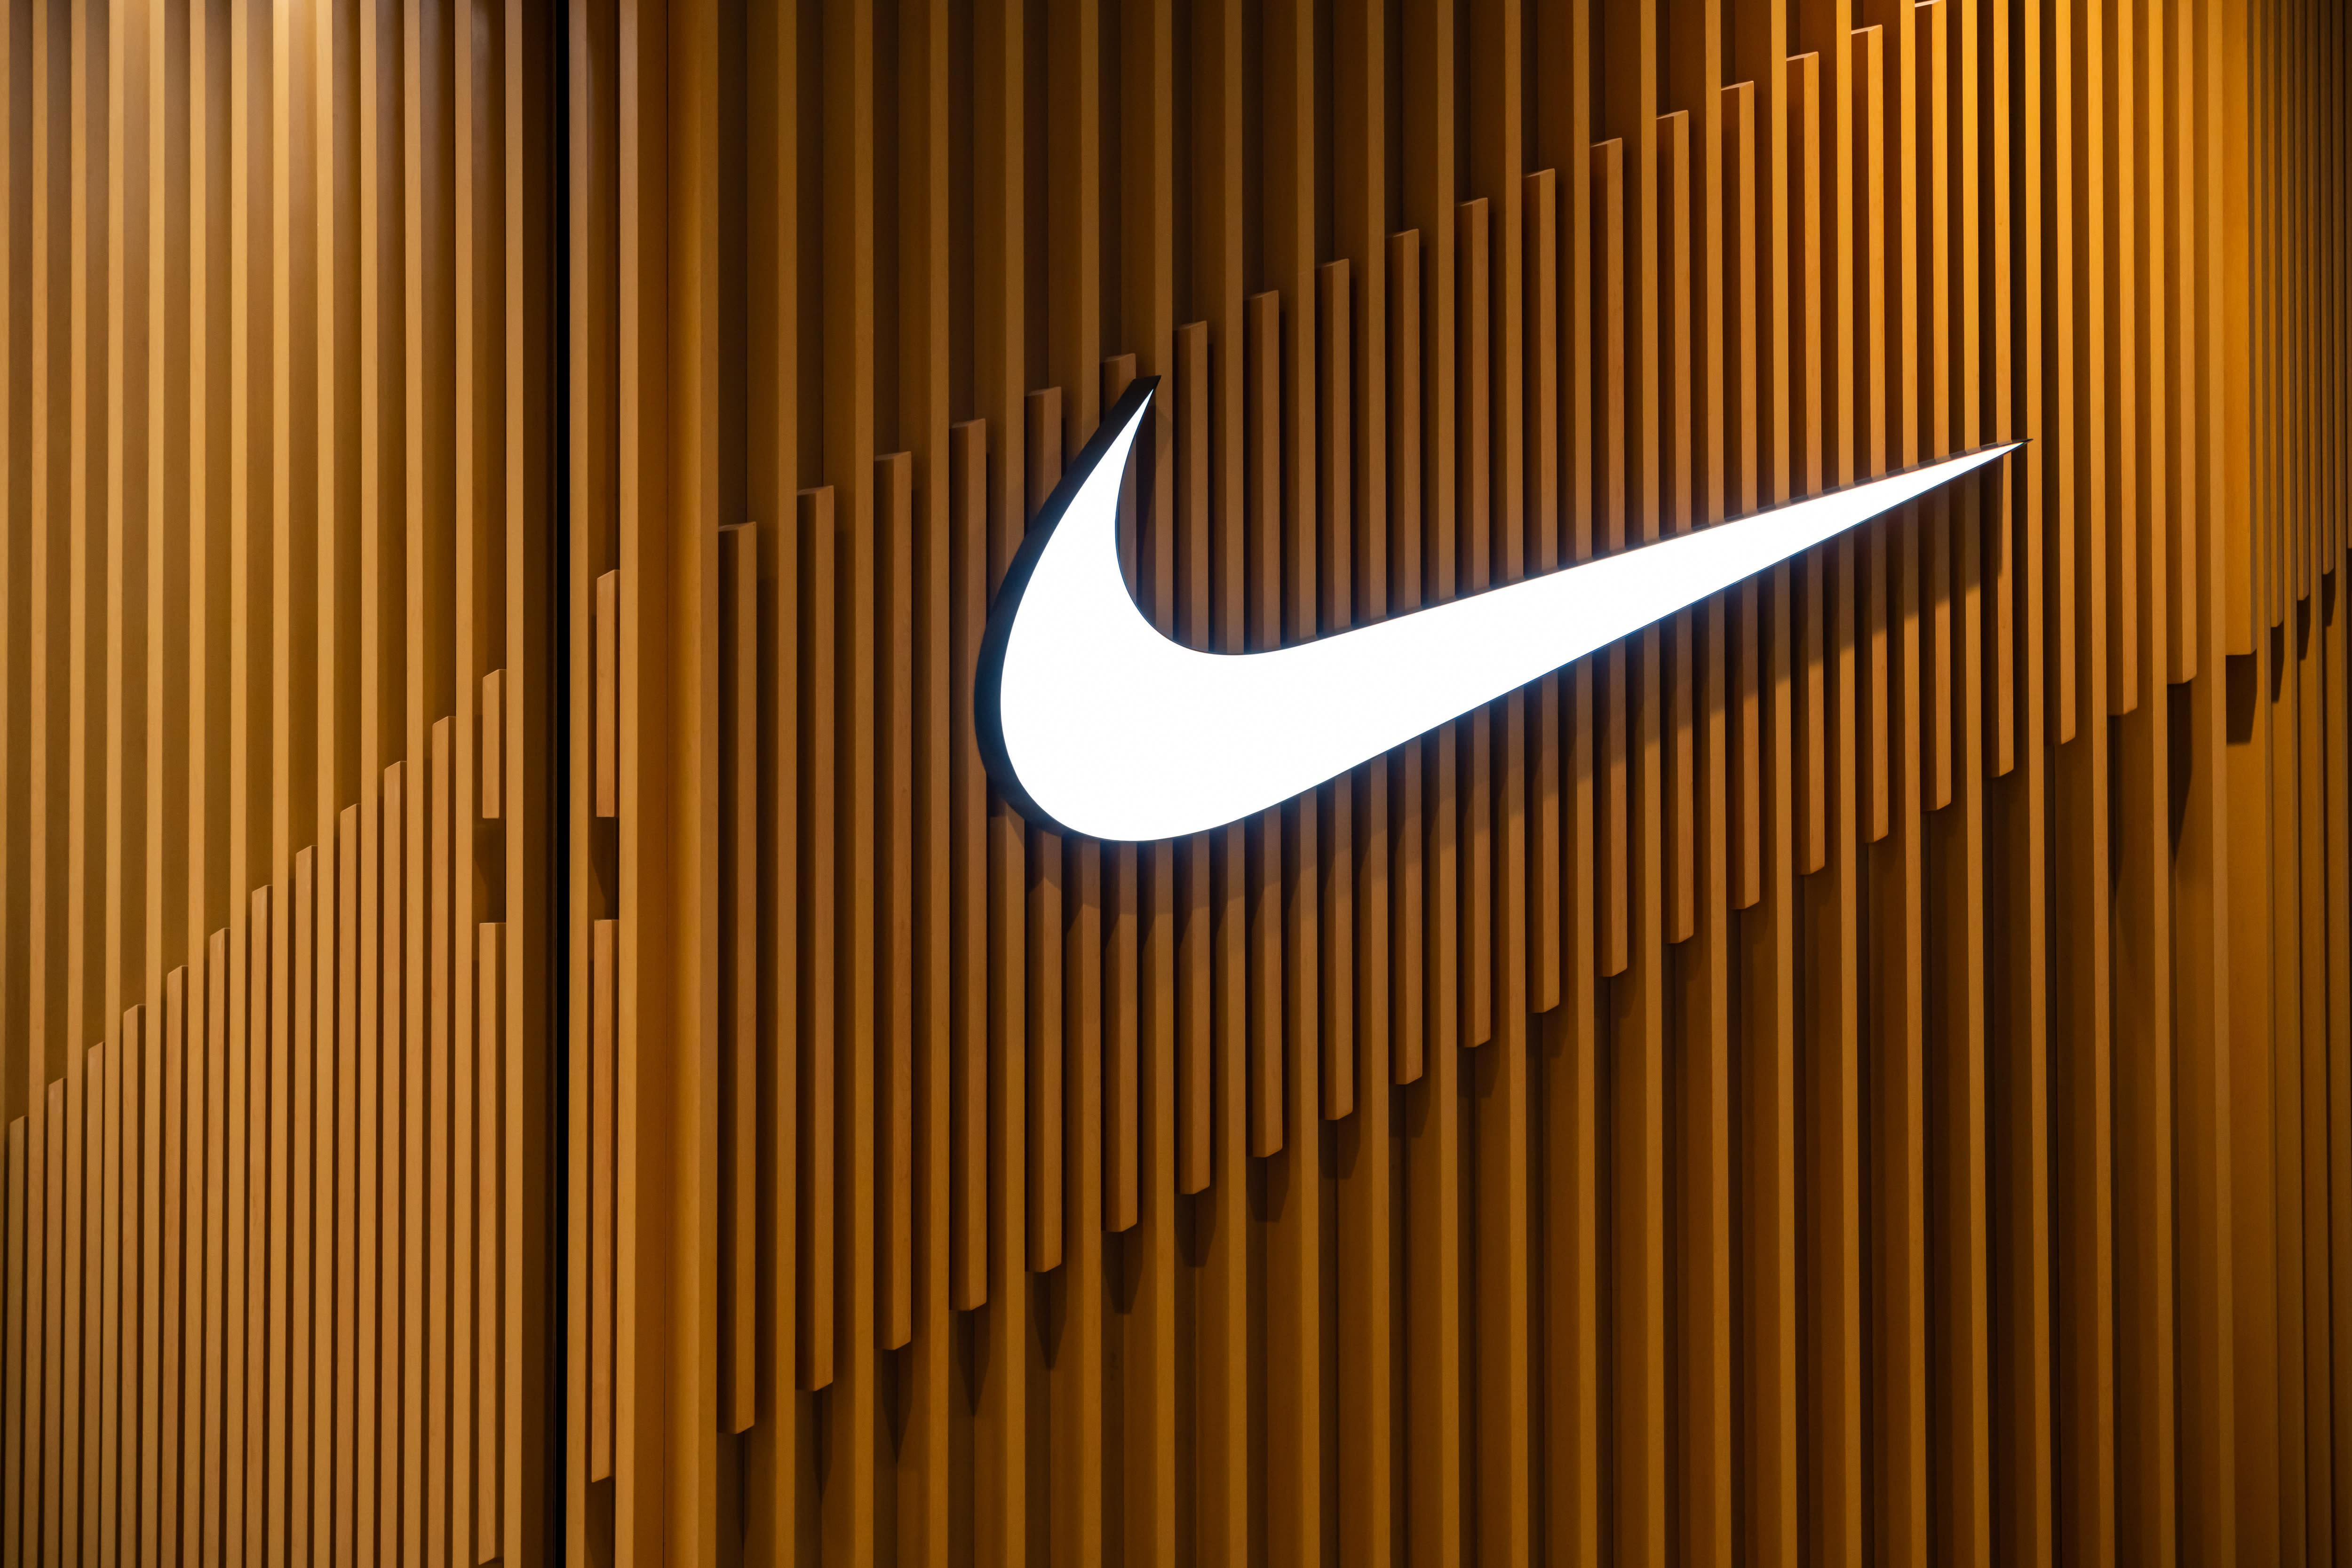 Consumer-focused tech pushes Nike toward 2020 - Yahoo Finance